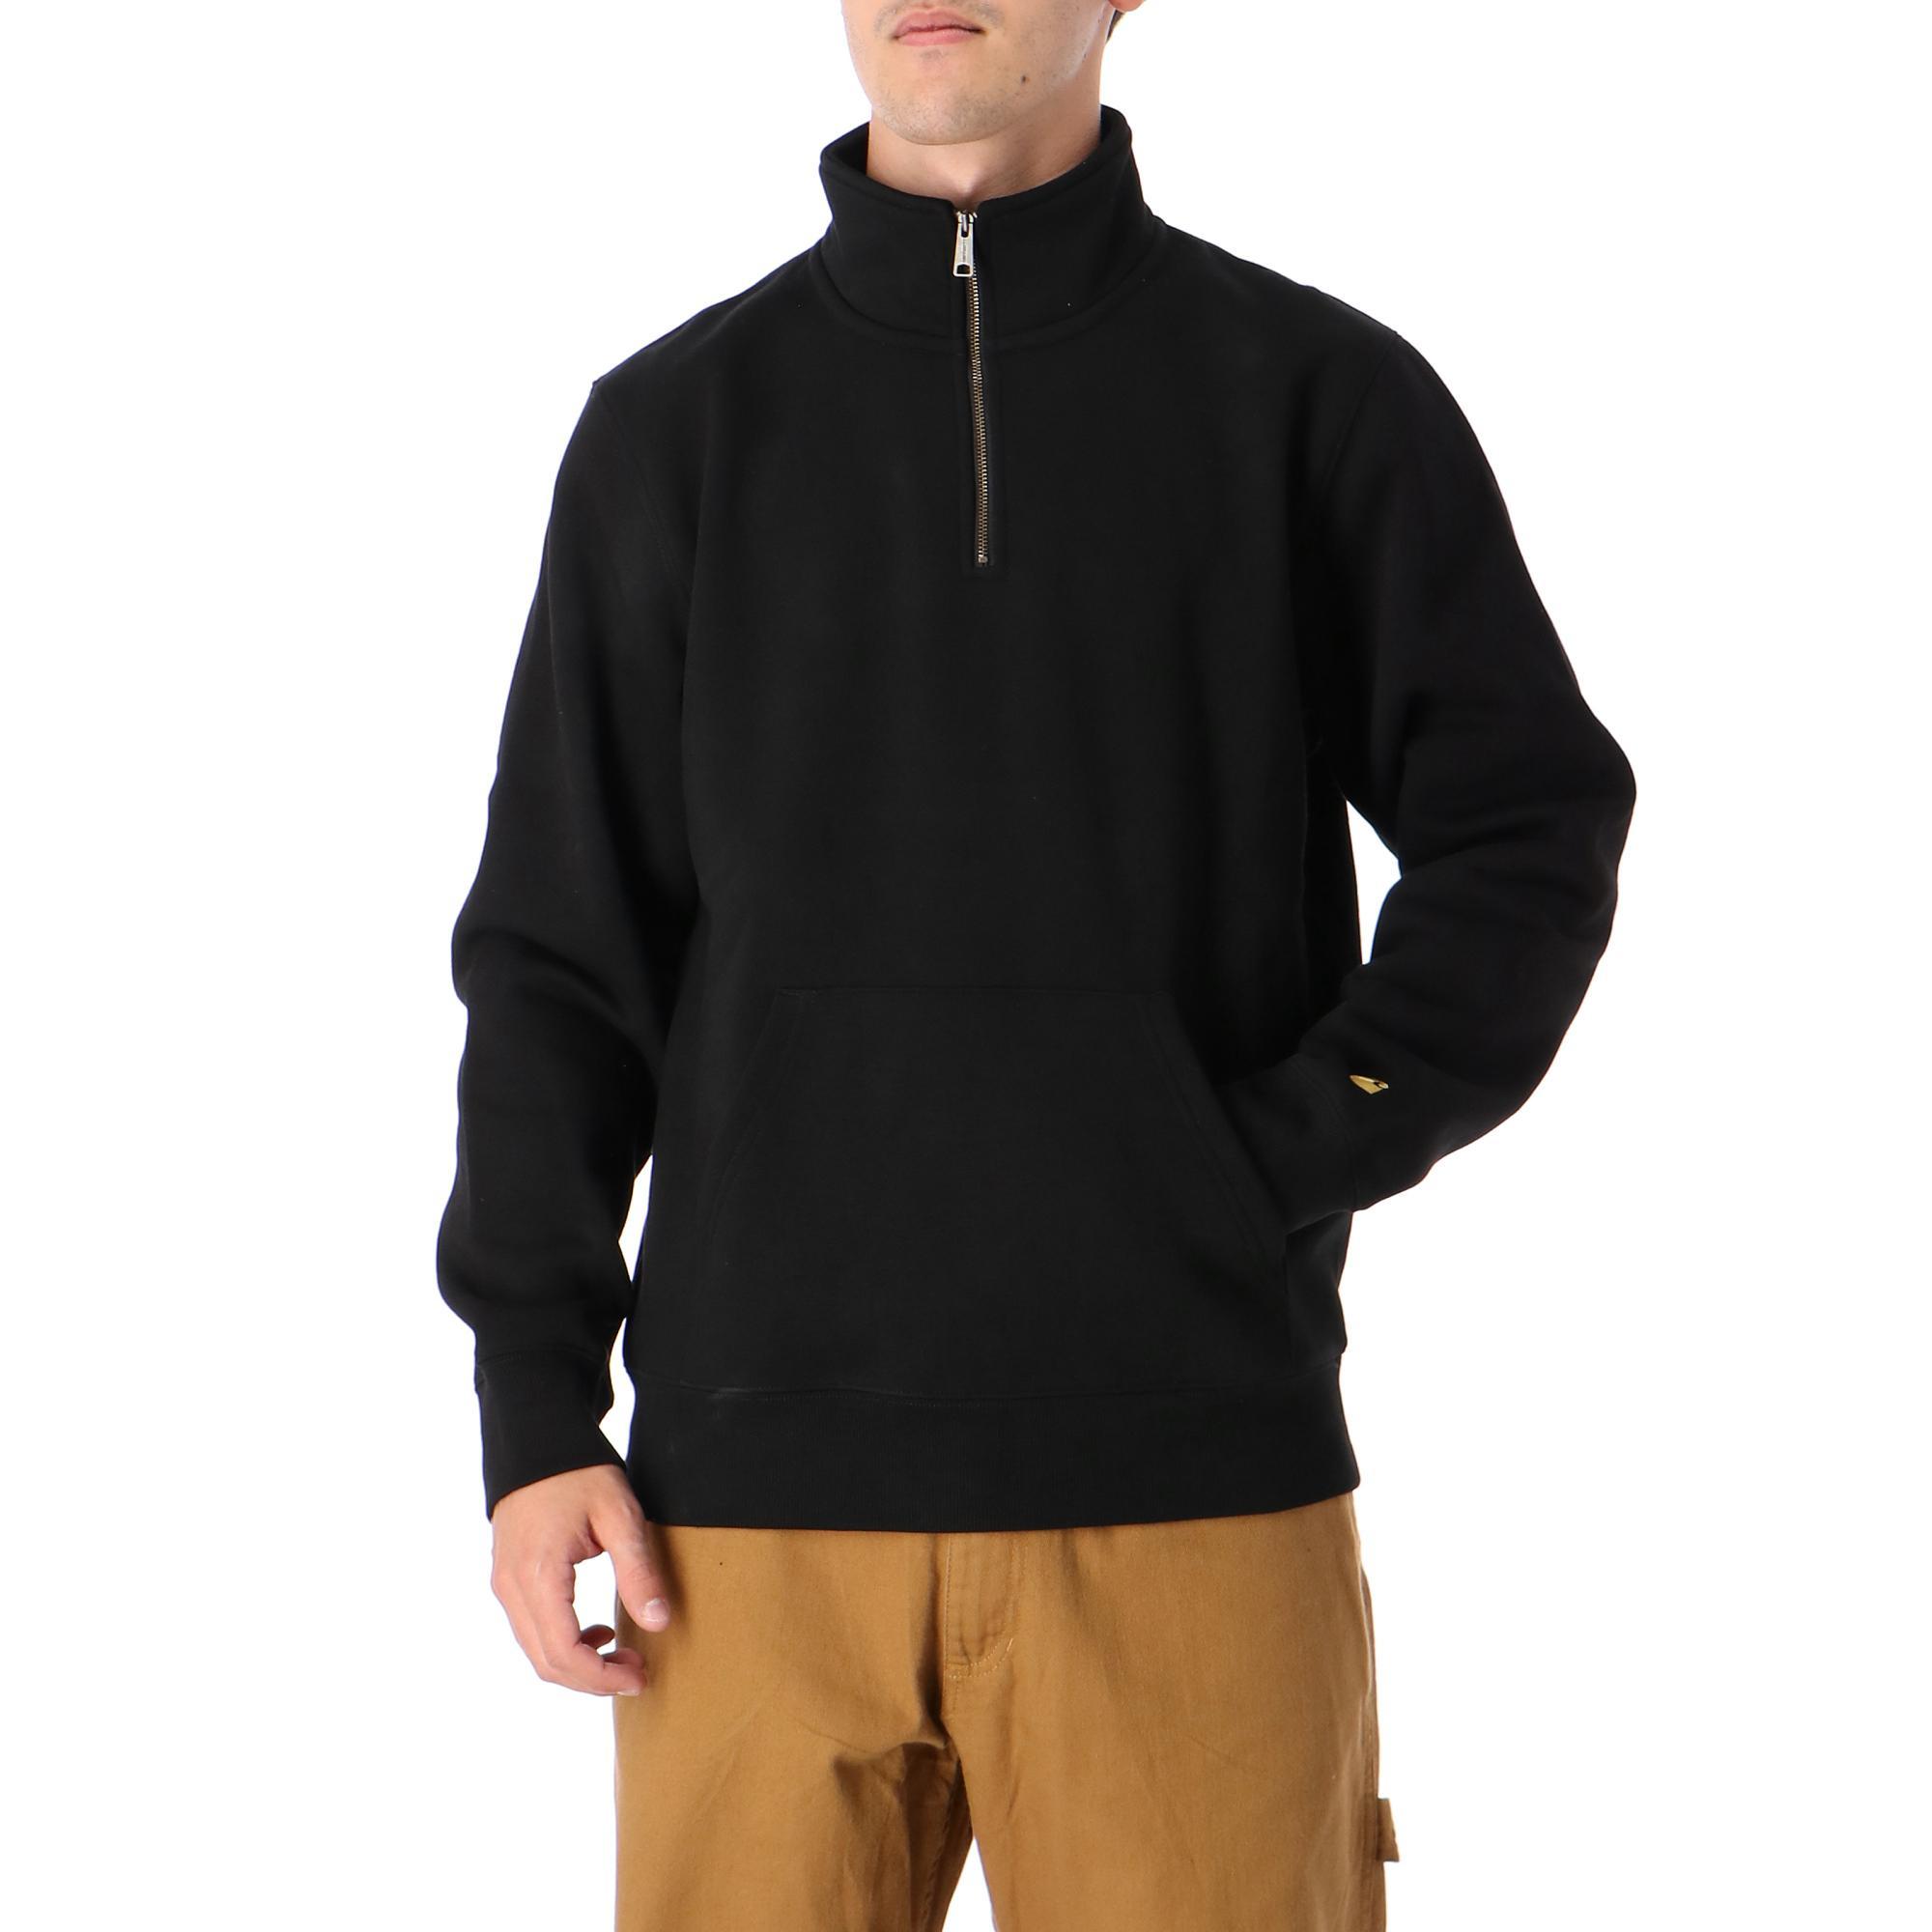 Chase Neck Zip Sweatshirt Black gold